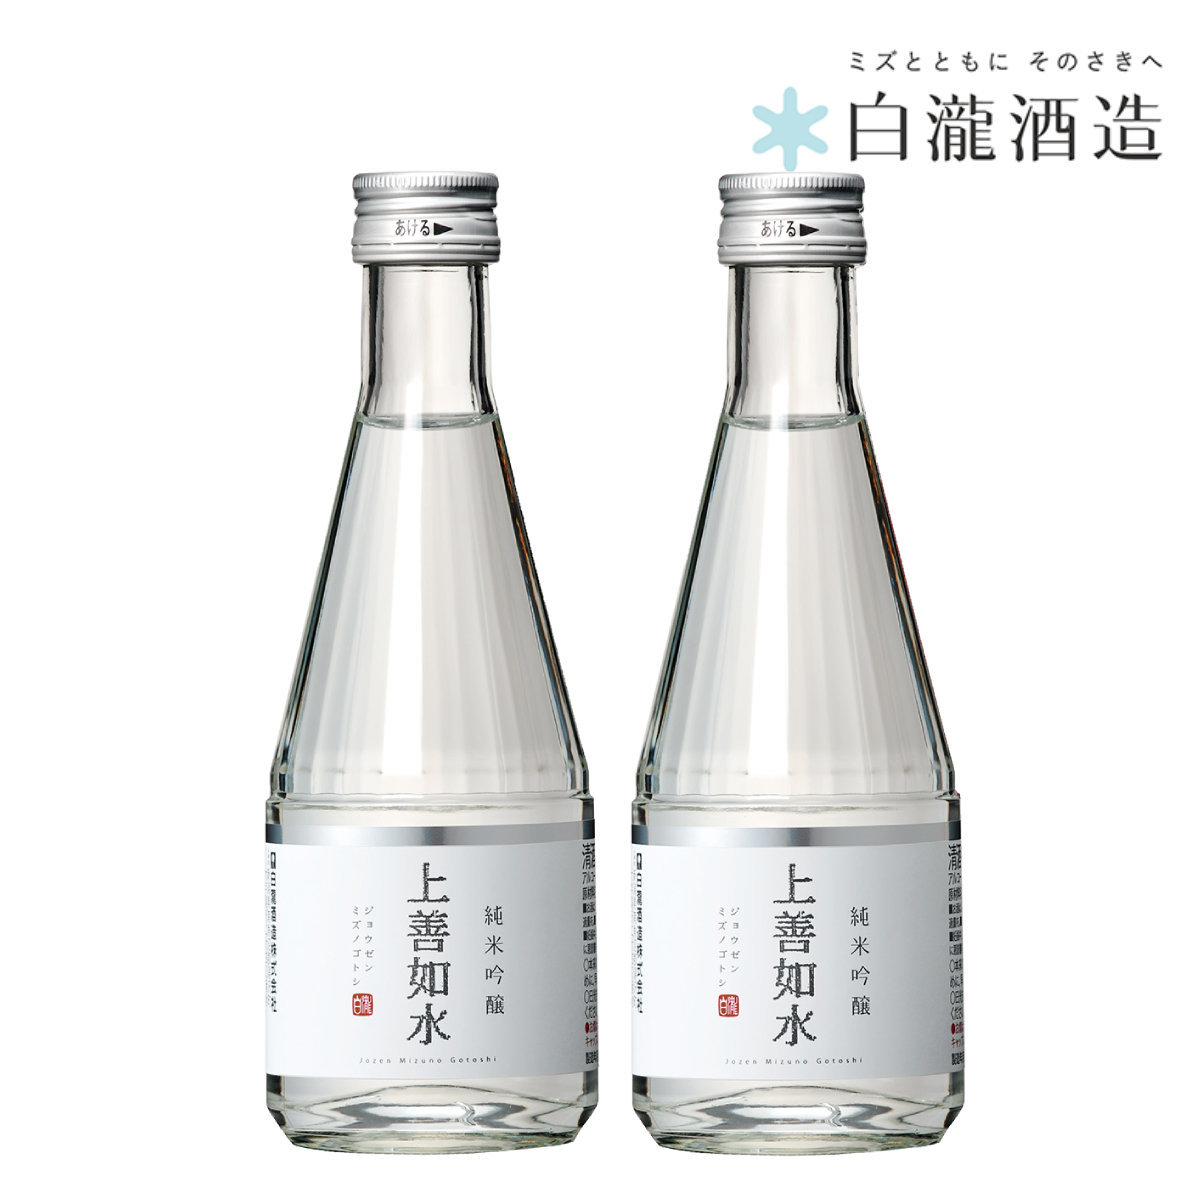 Japan Joen Mizunogotoshi Junmai Ginjo 300ml X2